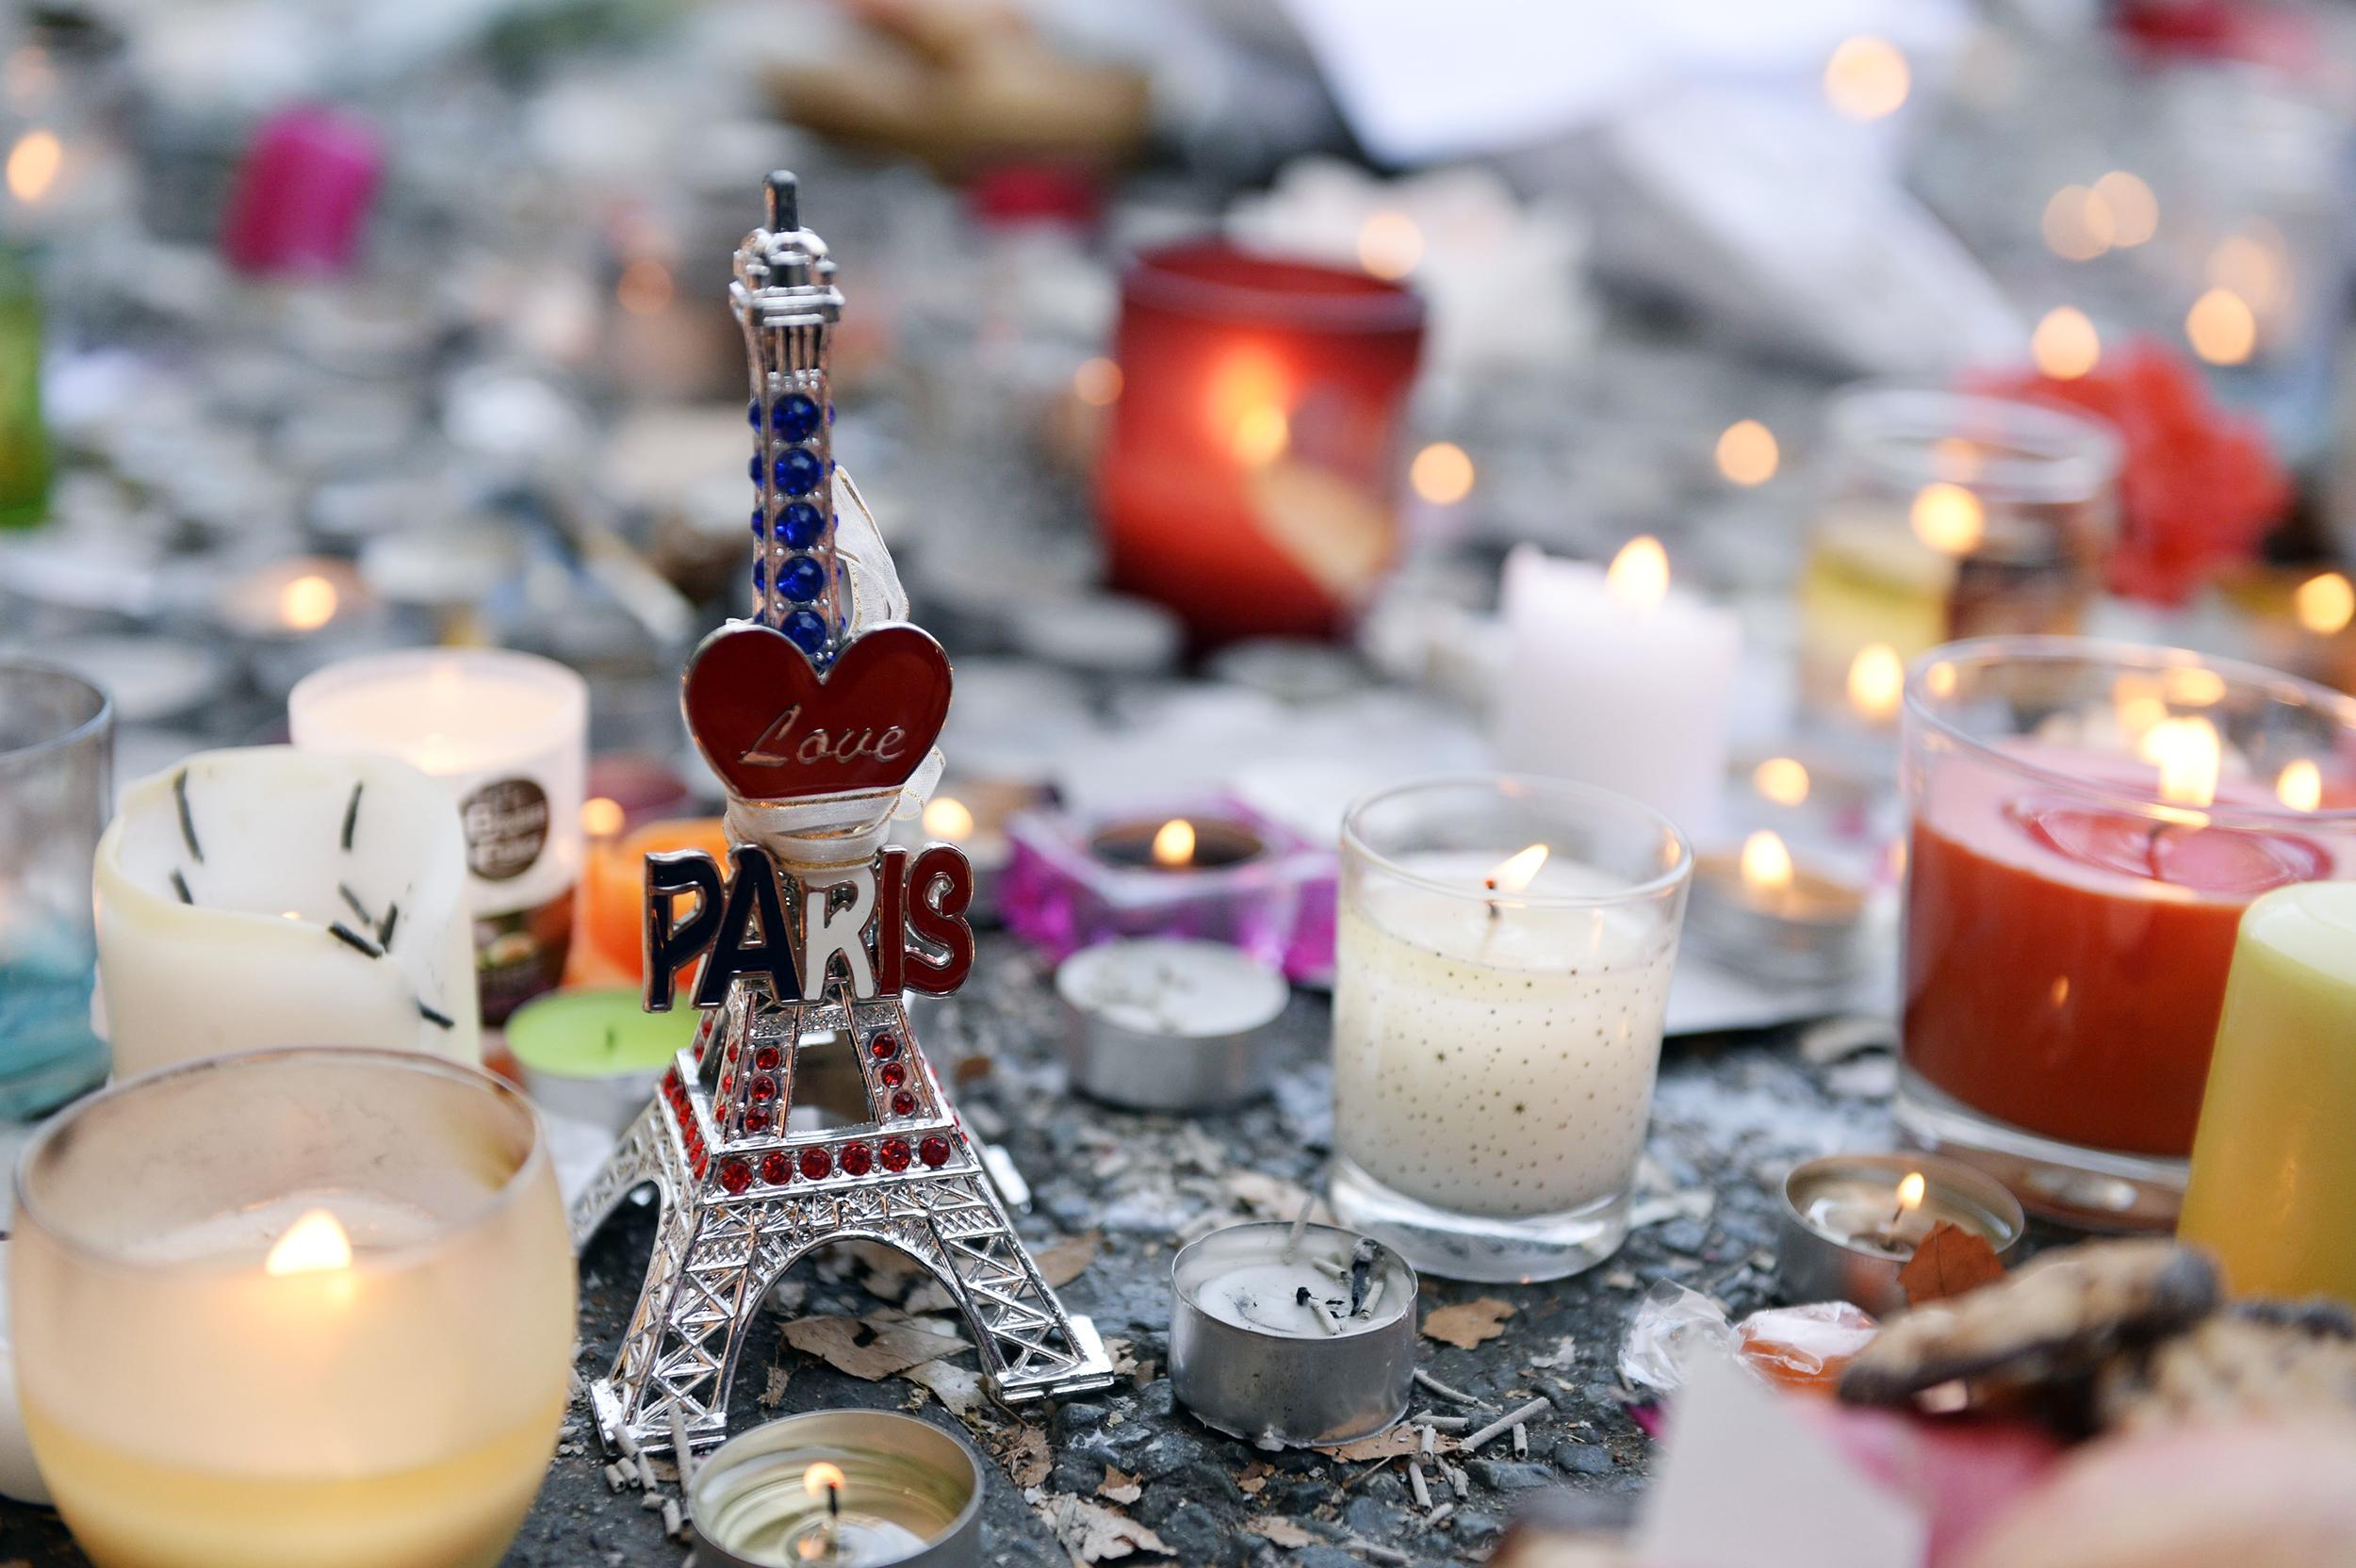 Follow Live Latest Updates on Paris Attacks